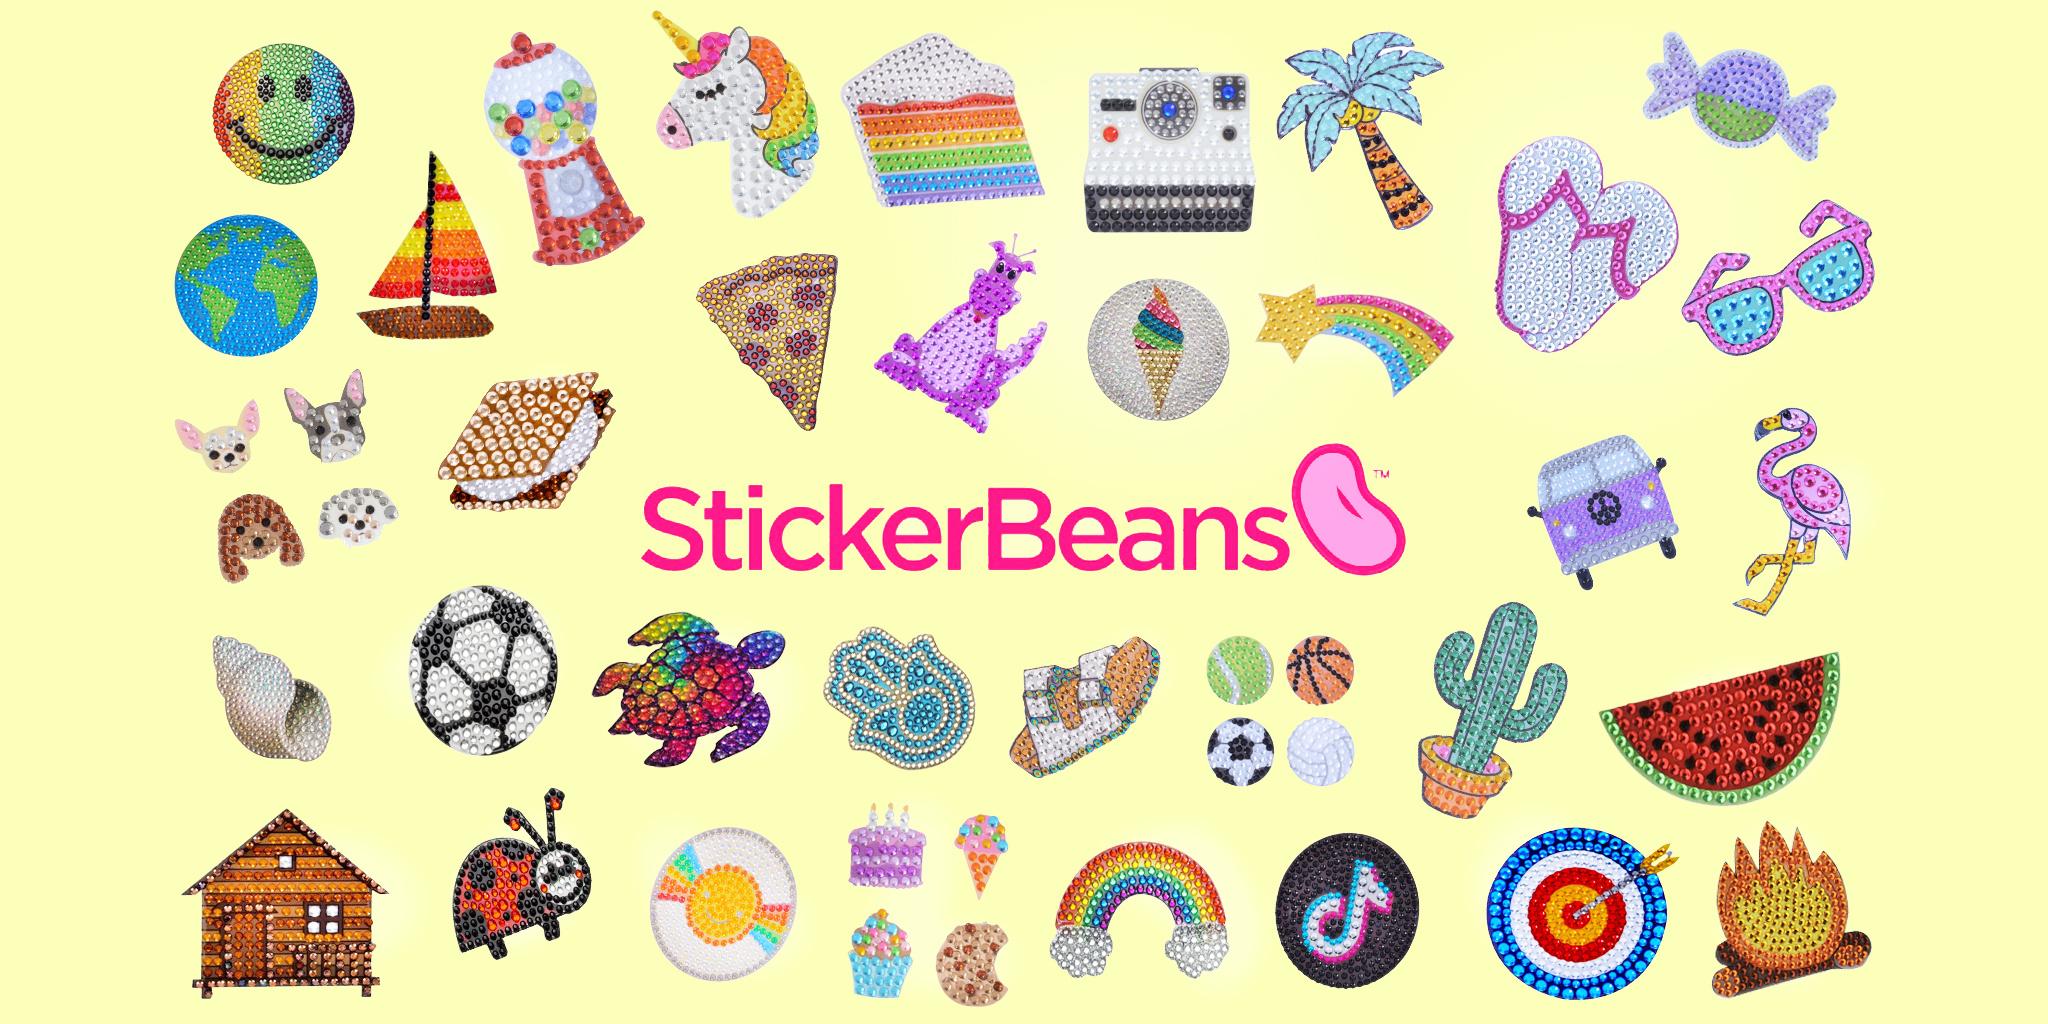 Sticker Beans